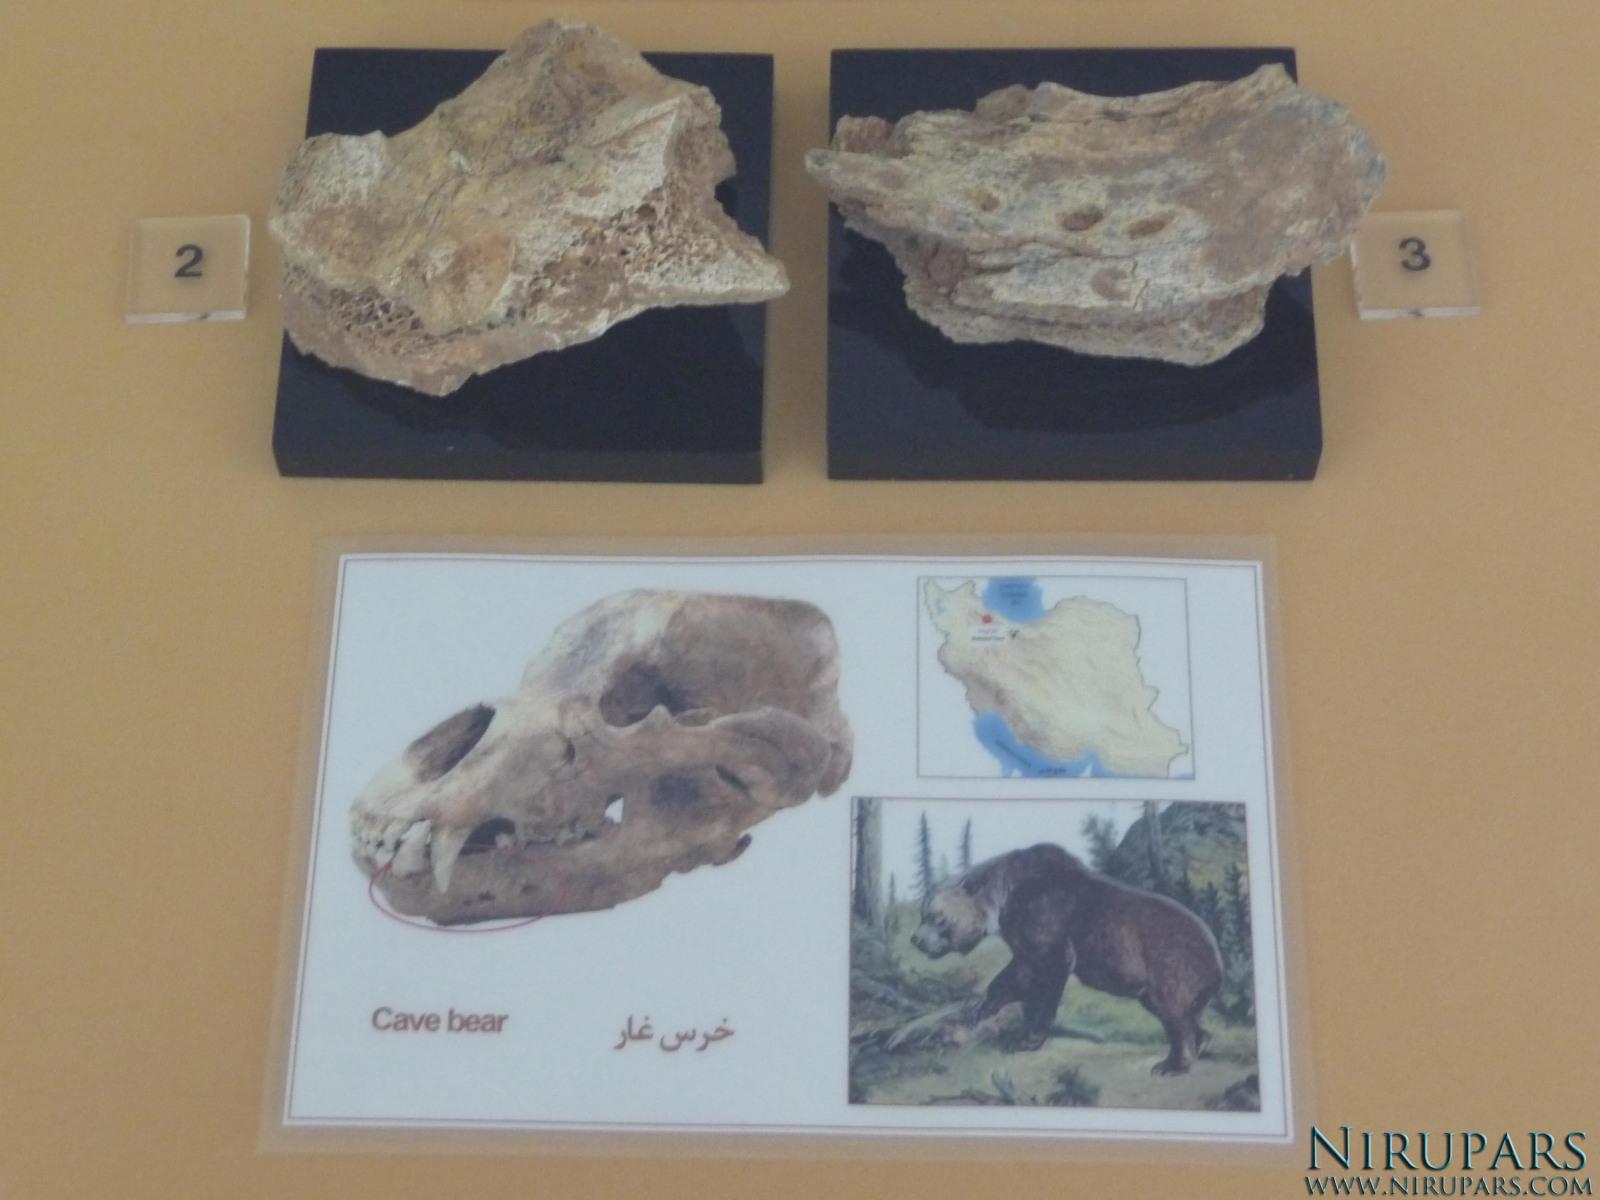 National Museum of Iran - Bone Cavebear Jaw Fragment